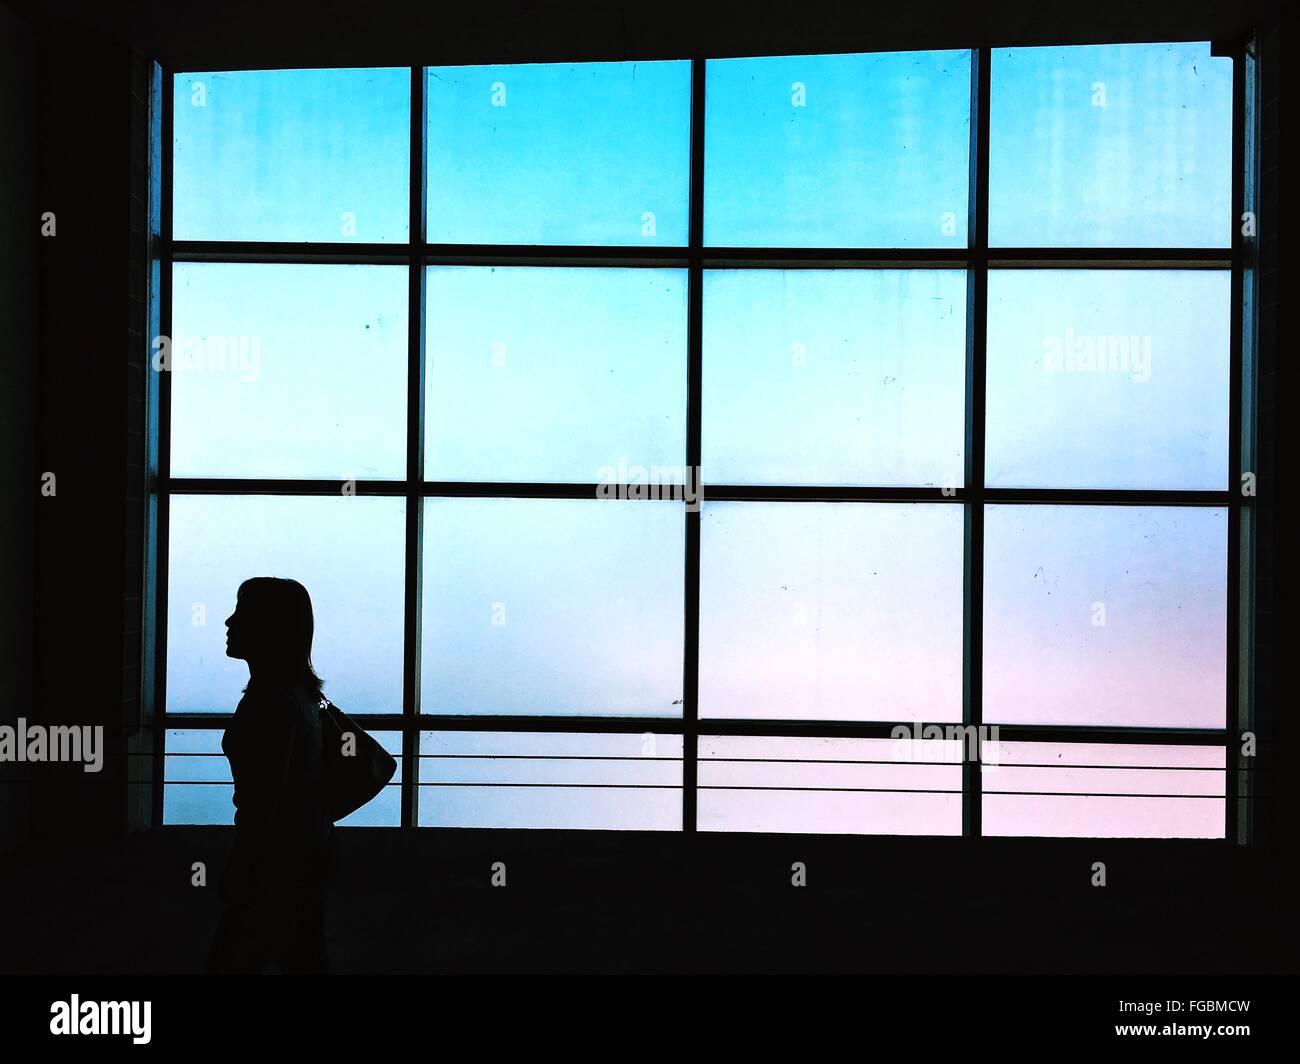 Silhouette Woman Walking In Parking Lot - Stock Image